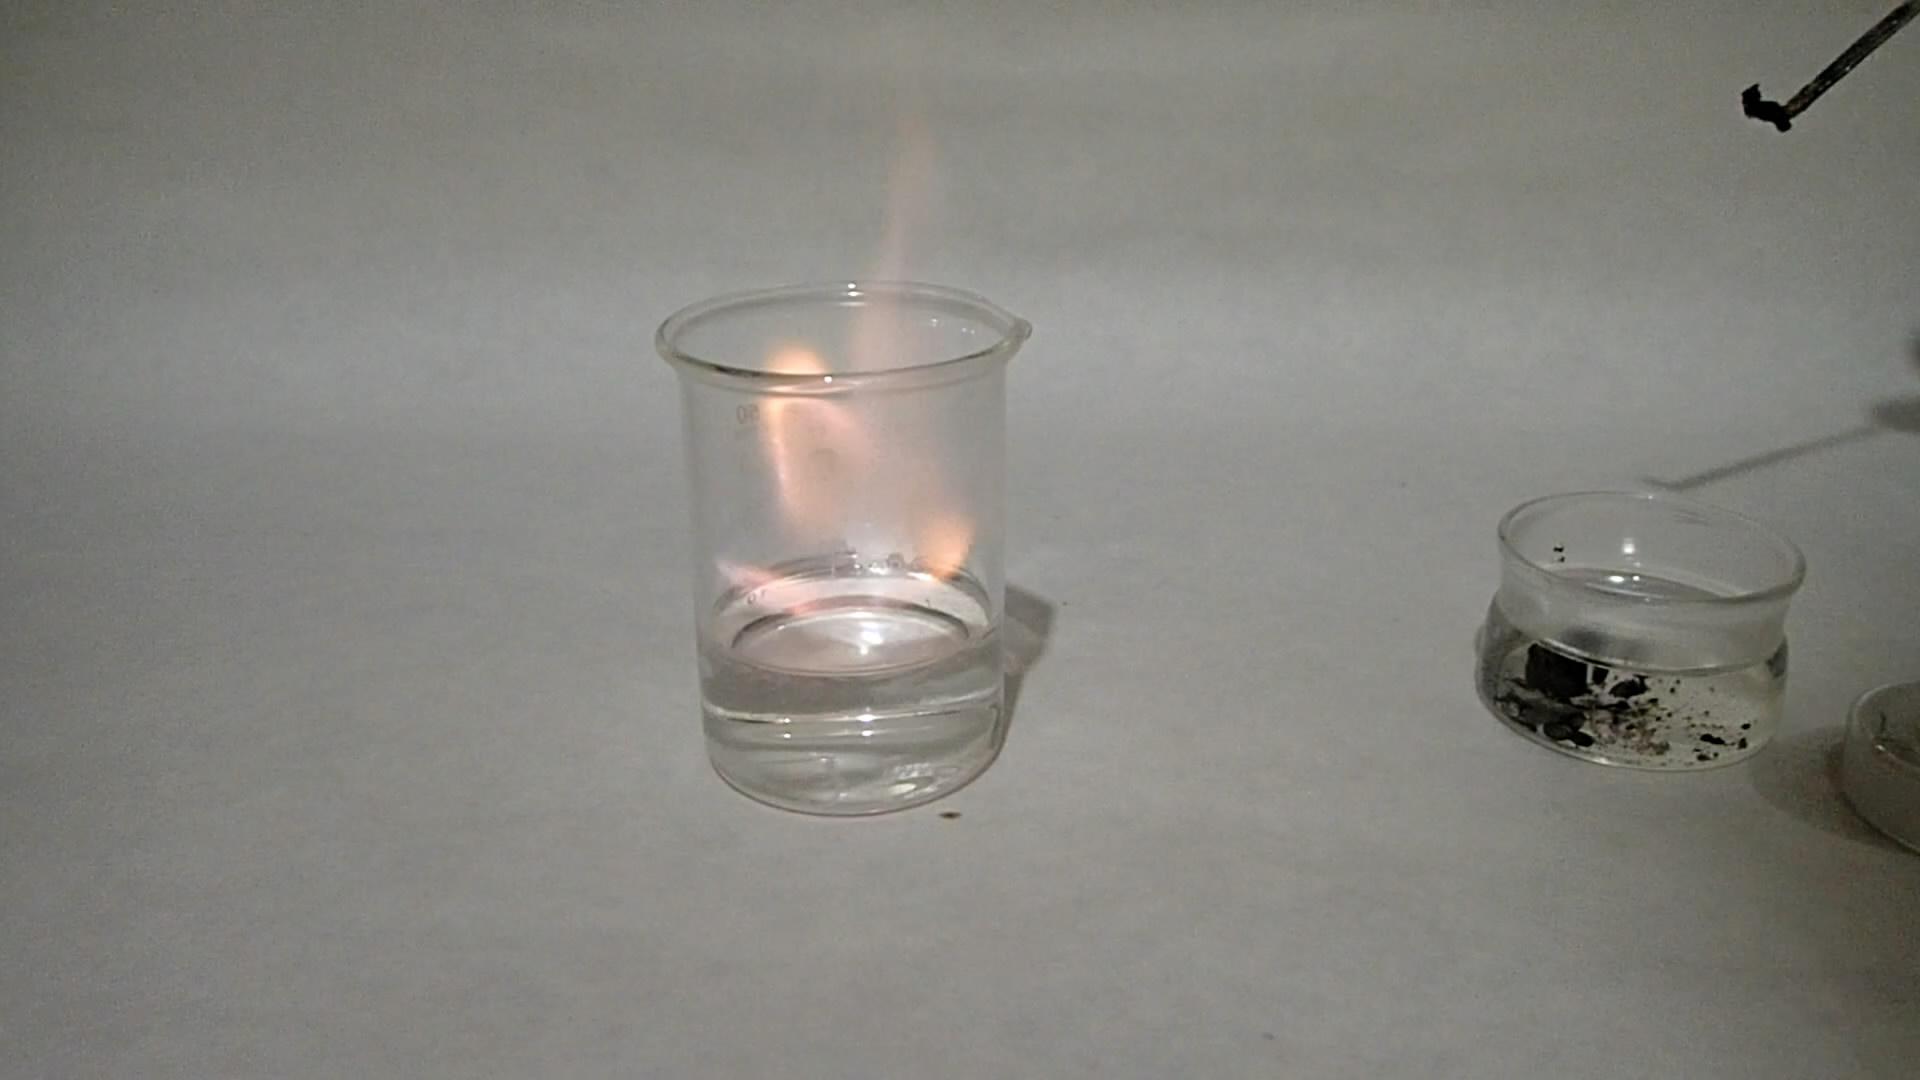 Metallic caesium. Caesium in air. Caesium and water. Caesium and ethanol. Металлический цезий. Цезий на воздухе (самовоспламенение). Цезий и вода. Цезий и этанол